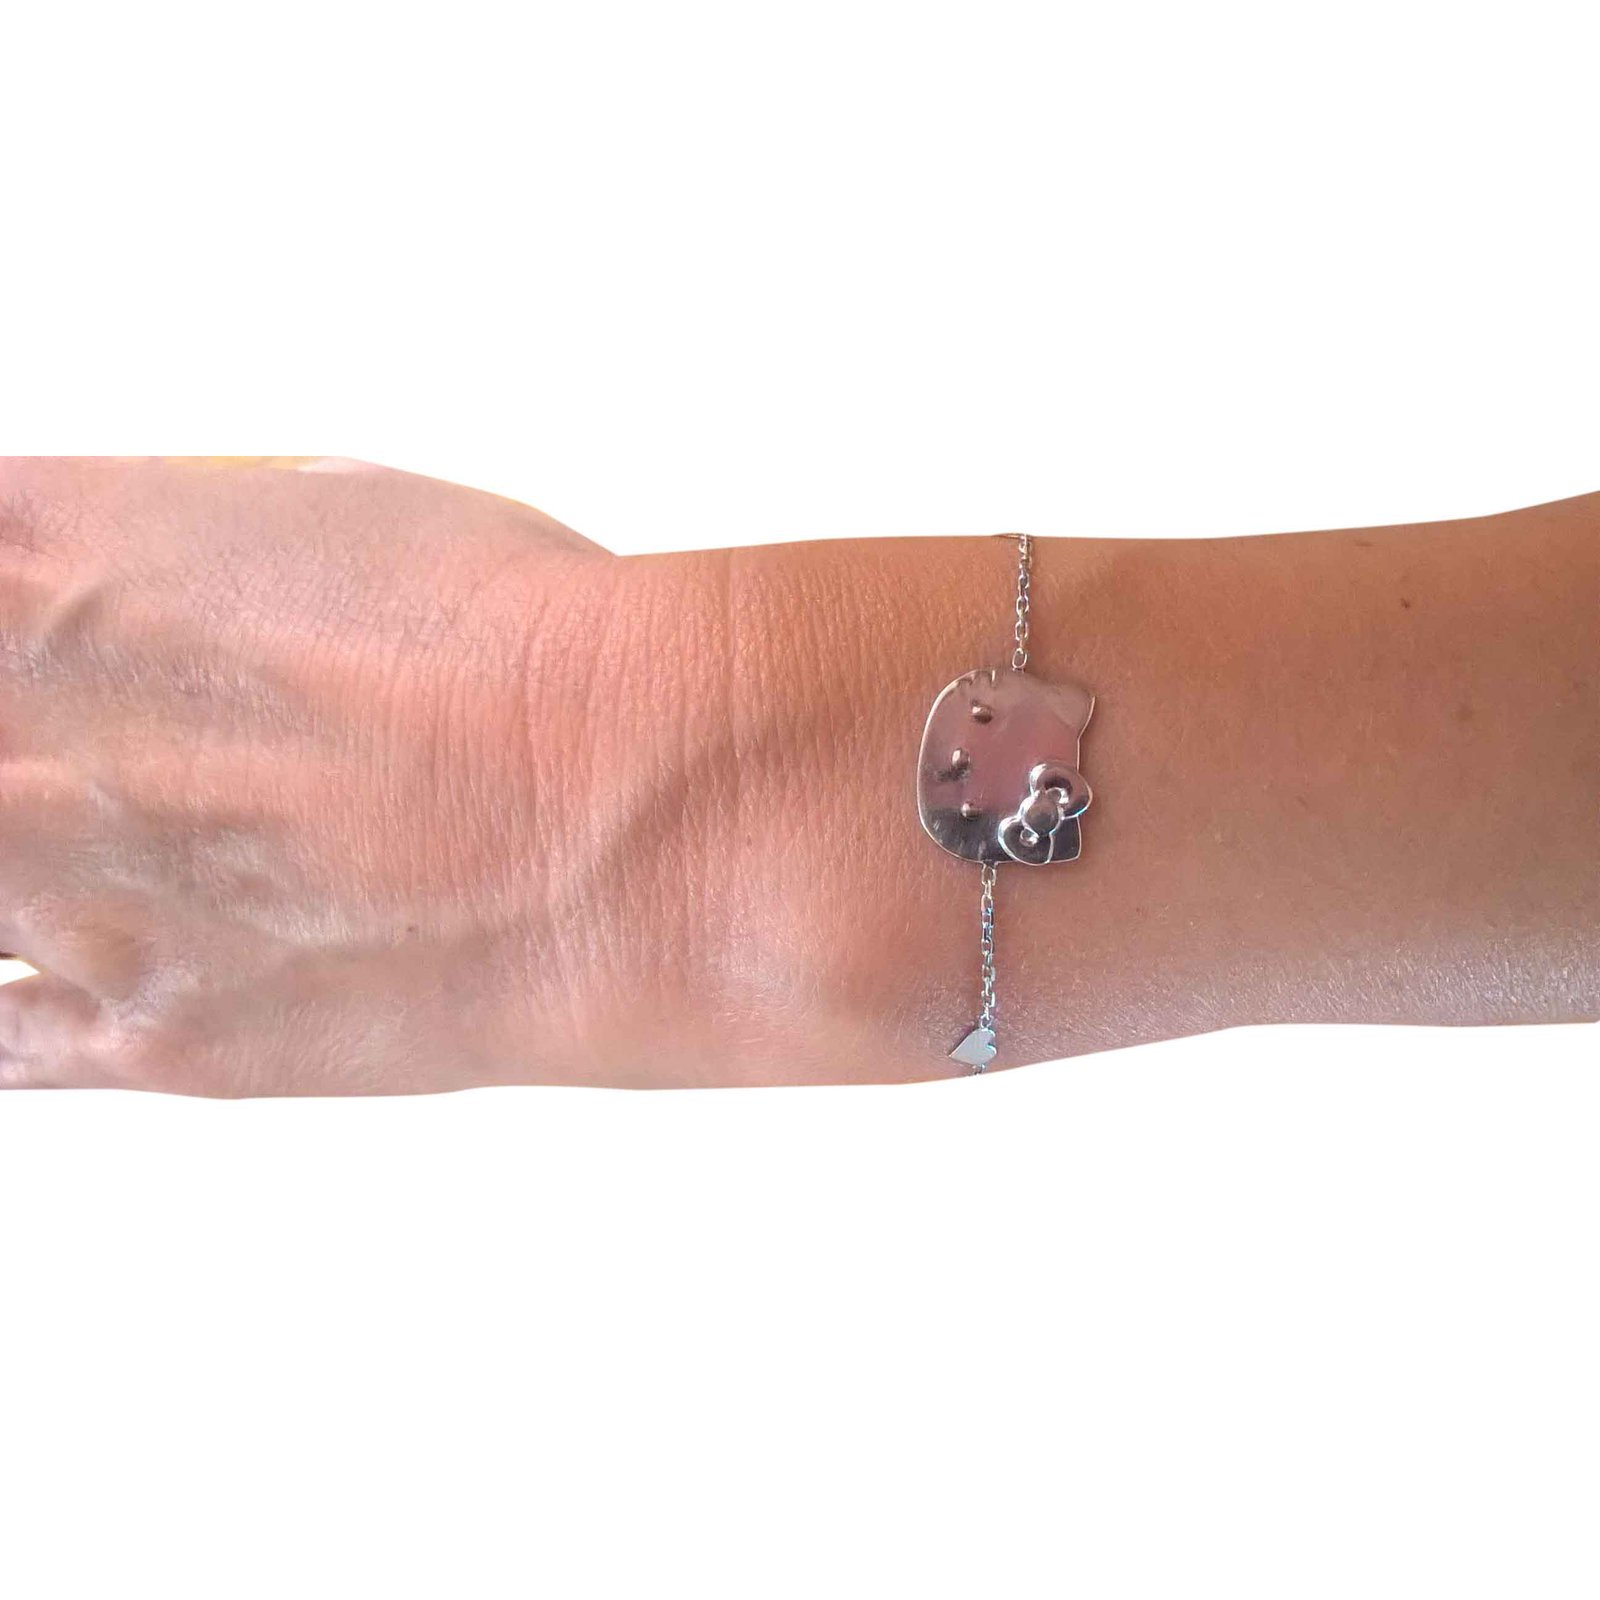 9a4d68116 Victoria Casal White gold bracelet Hello Kitty Bracelets White gold Silvery  ref.27144 - Joli Closet